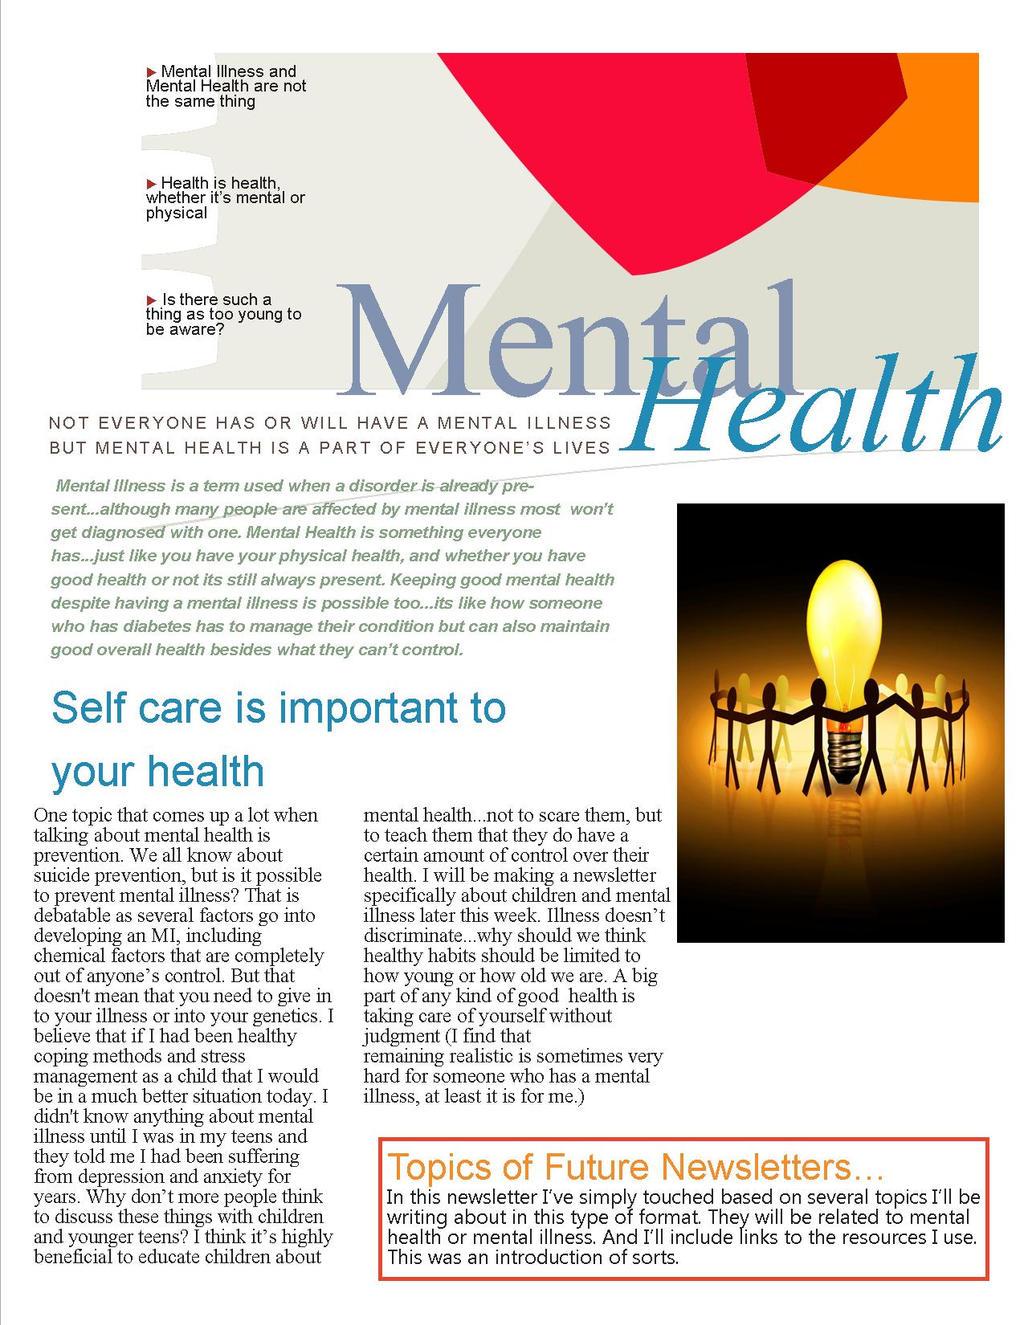 Mental health newsletter by ilovekakashi28 on deviantart for Health and wellness newsletter template